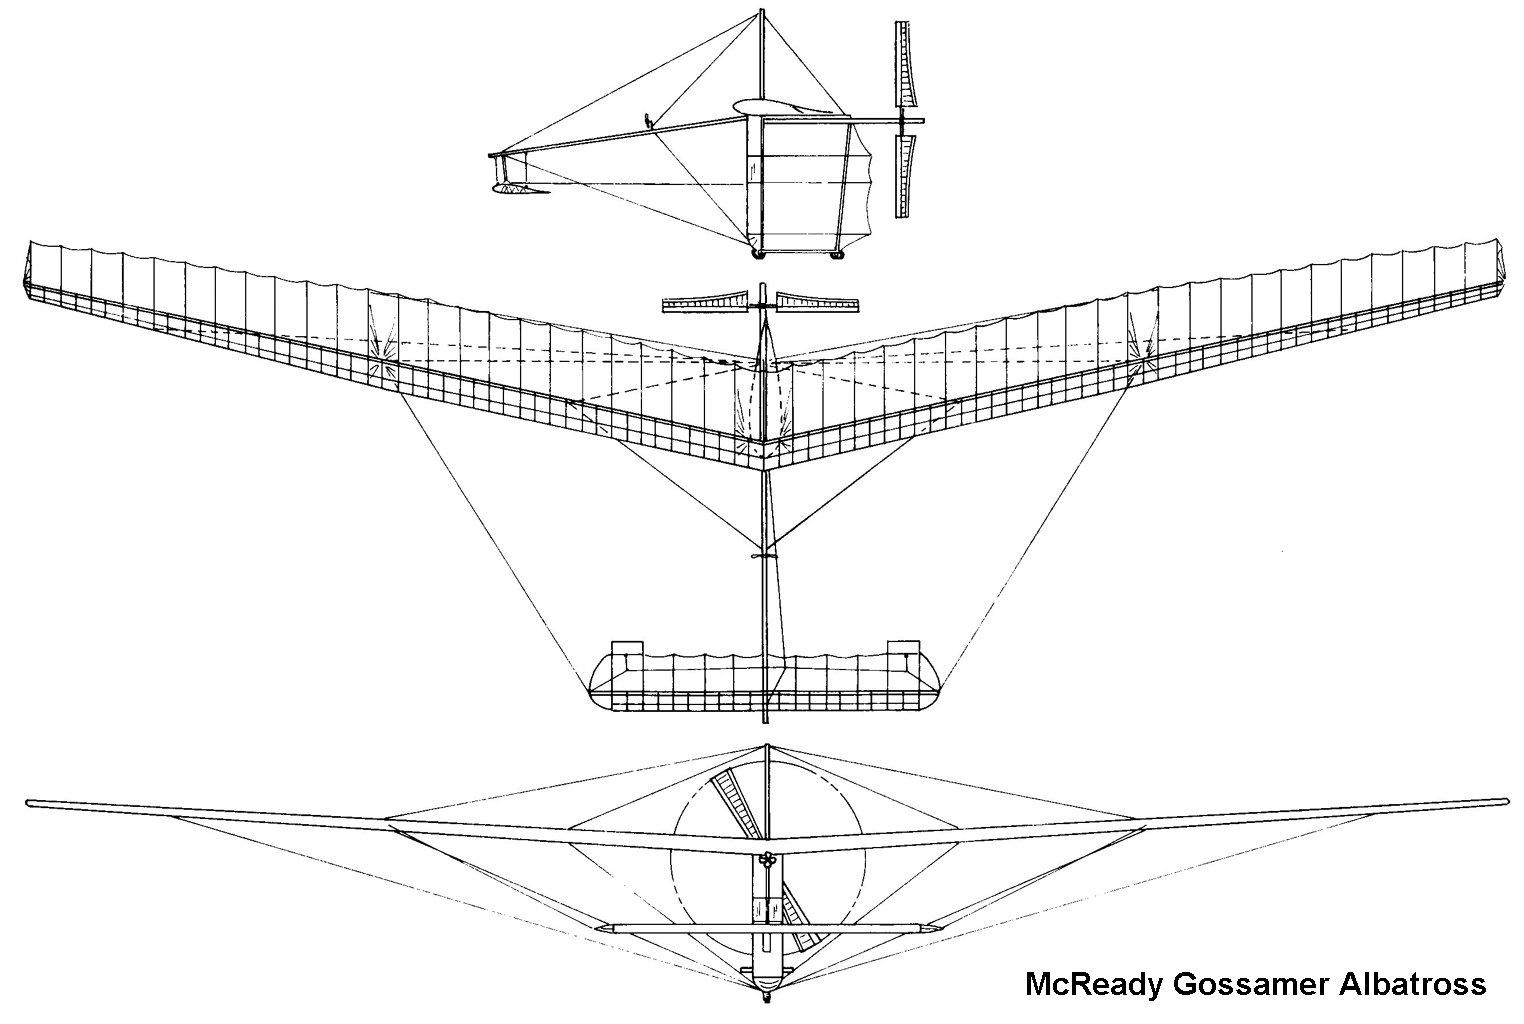 Gossamer Albatross; Pesawat Terbang Tenaga Manusia Pertama Di Dunia